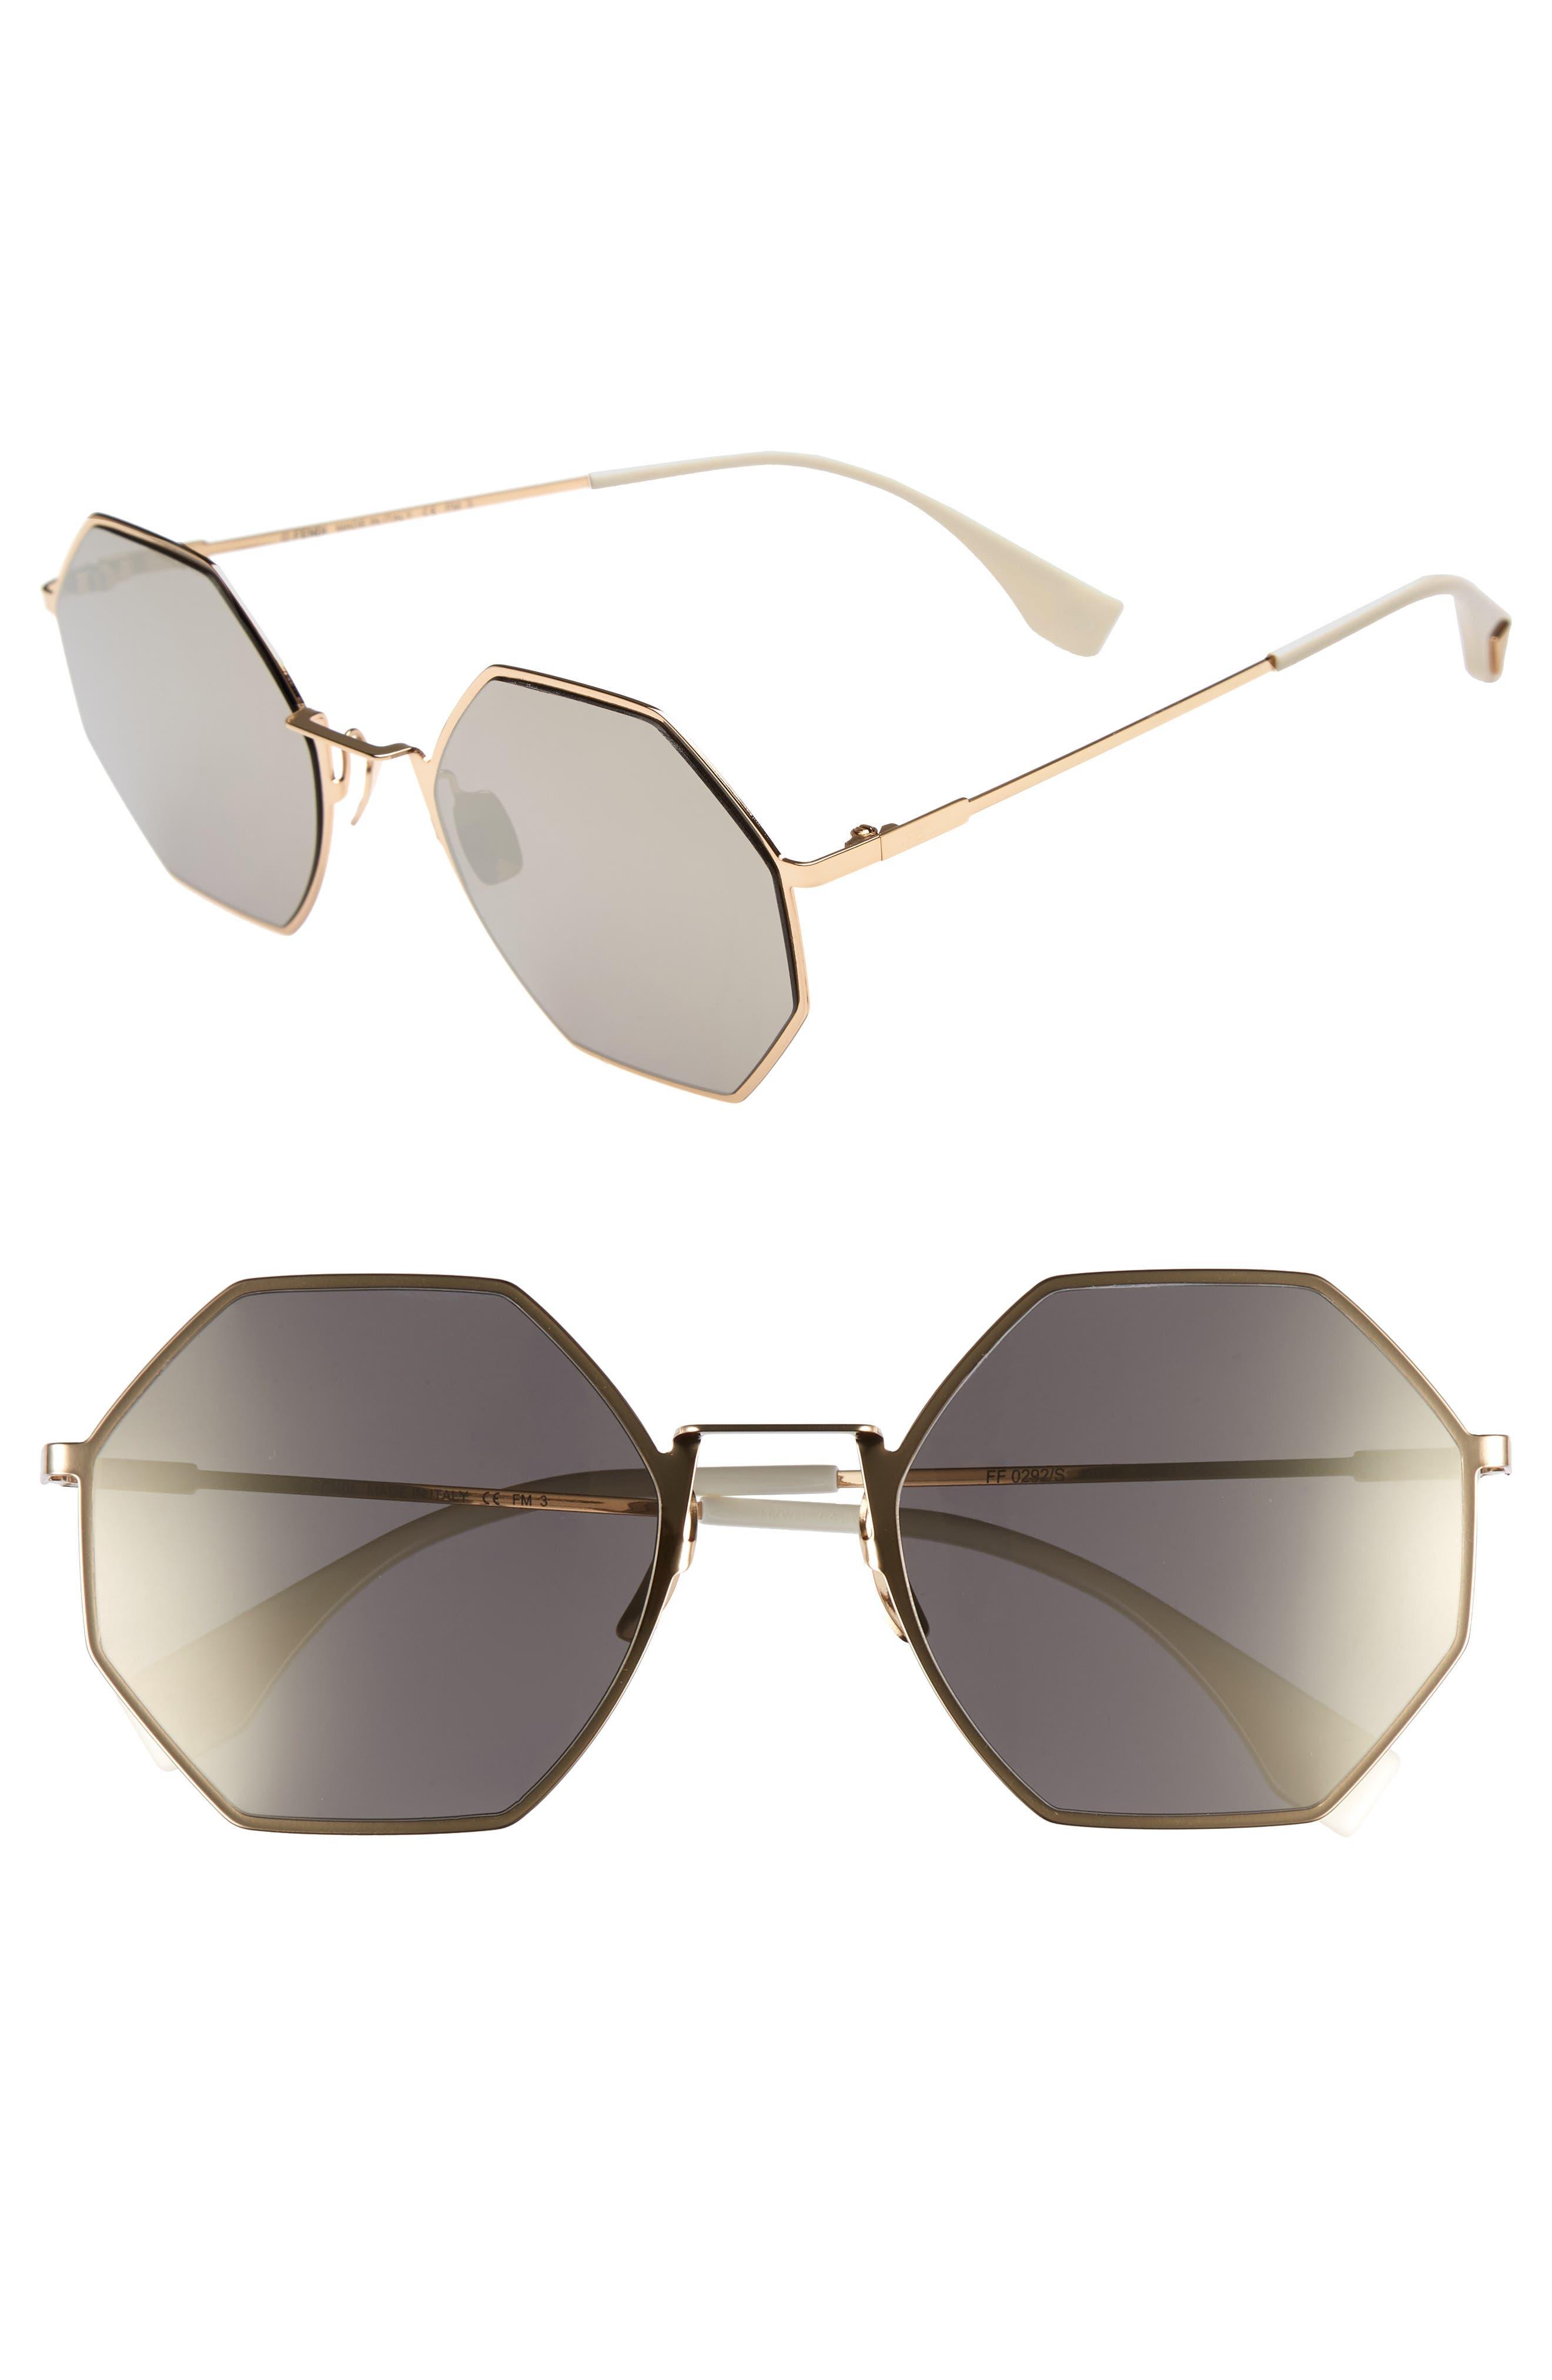 53Mm Octagonal Polarized Metal Sunglasses - Gold